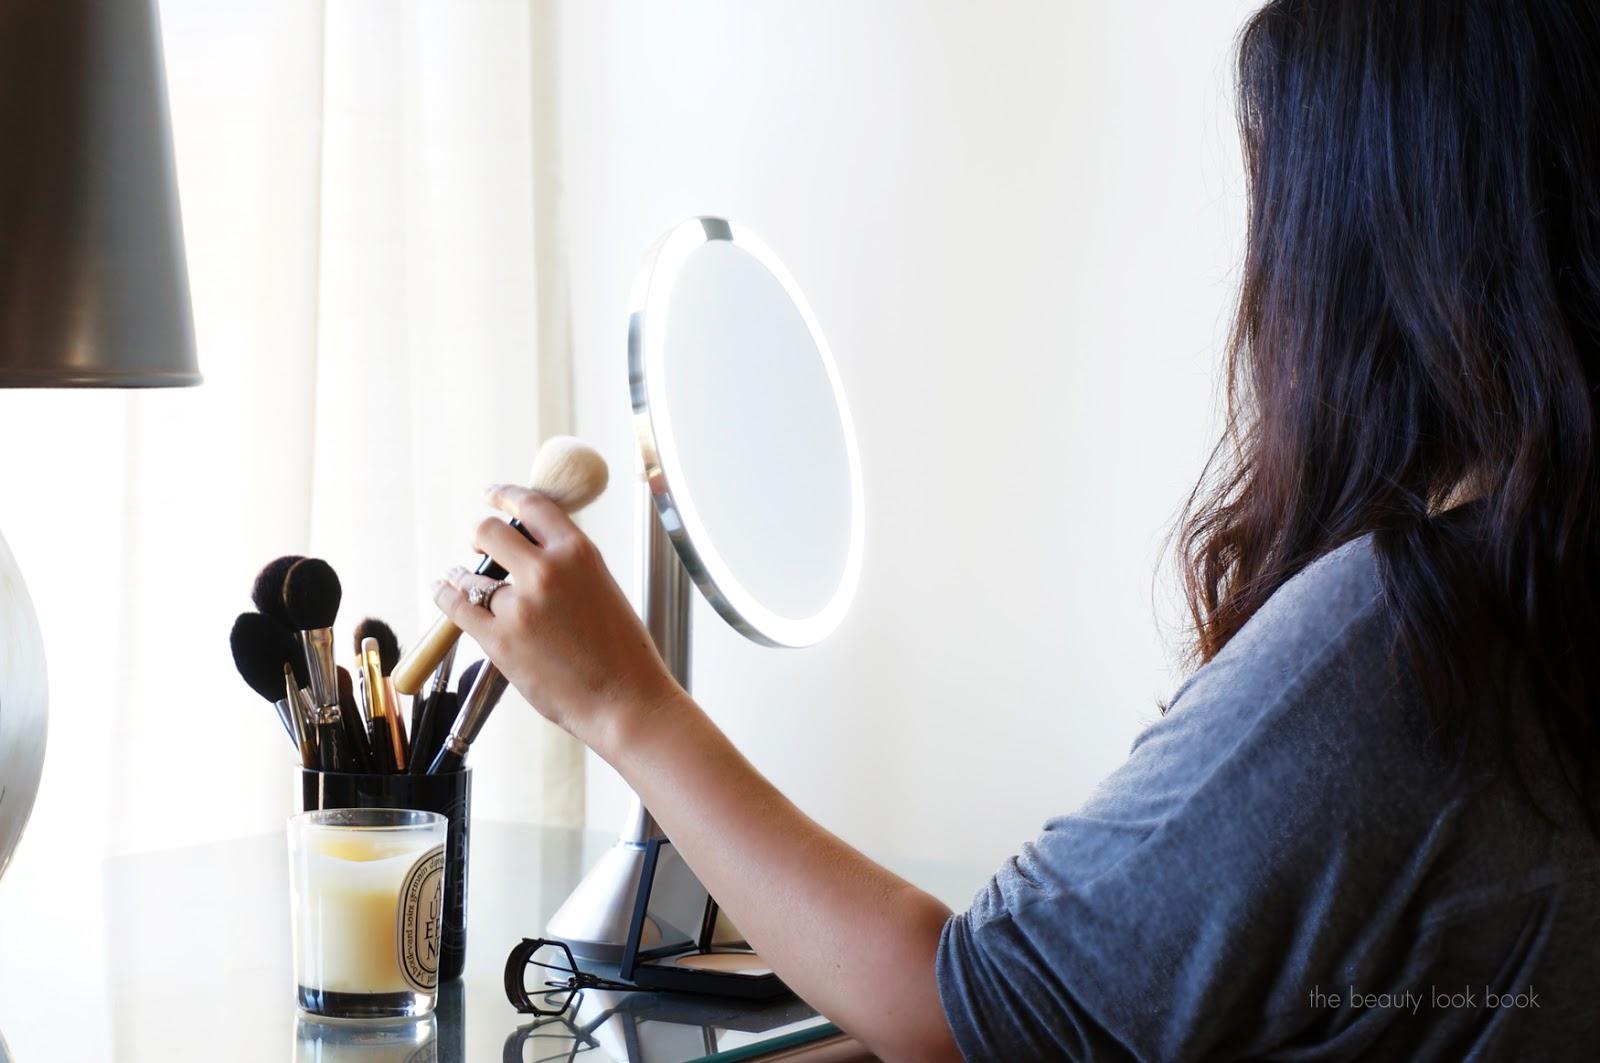 http://www.thebeautylookbook.com/2014/08/simplehuman-sensor-mirror.html